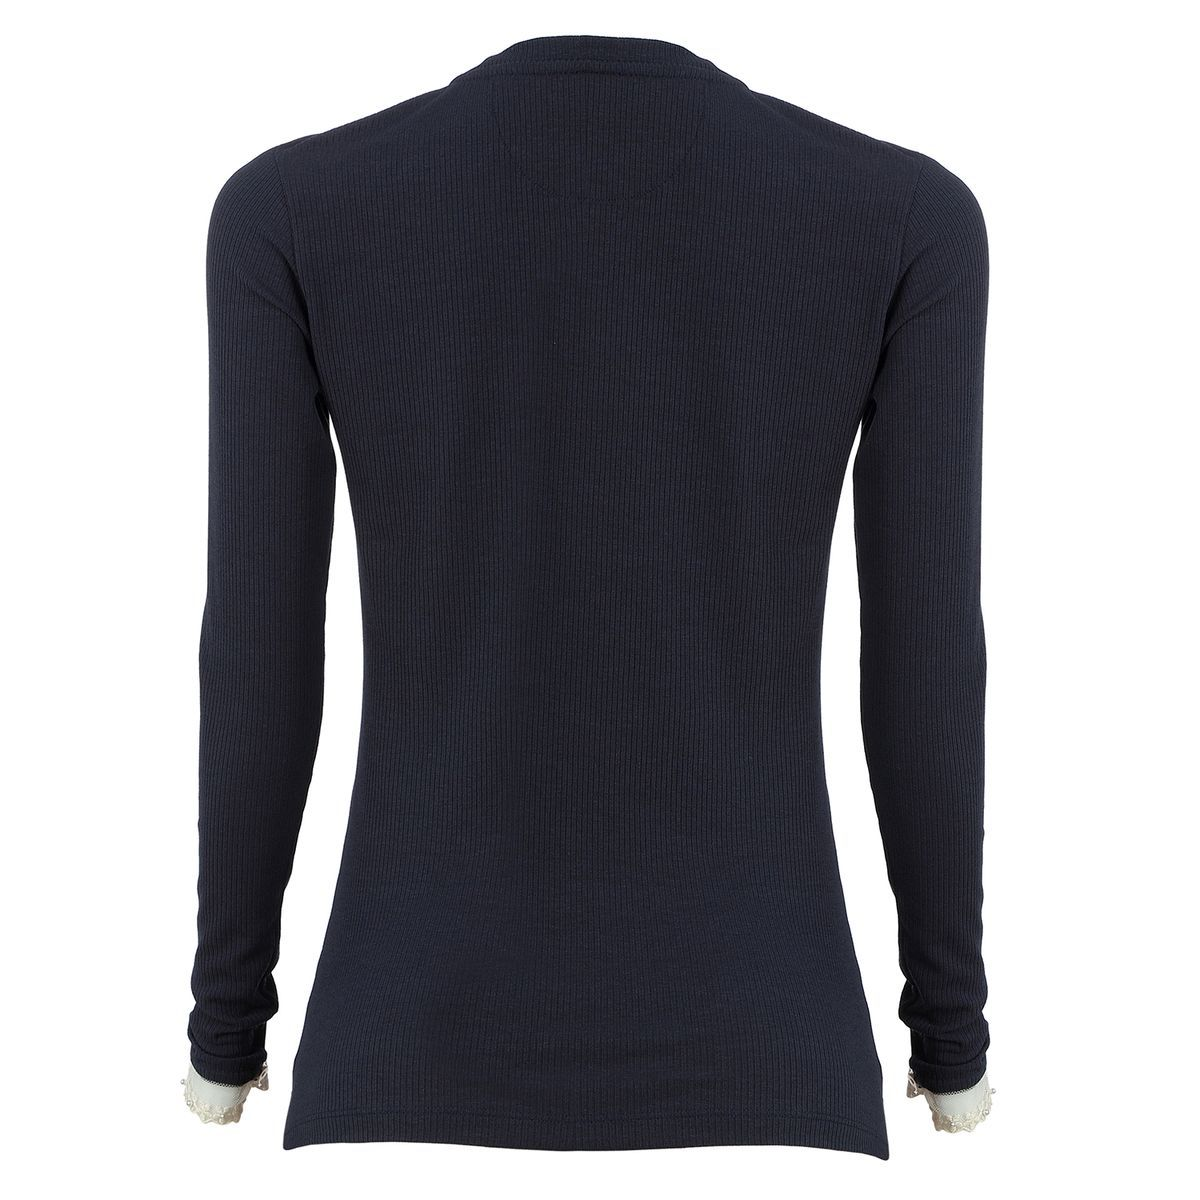 Camiseta Seeder Manga Longa Feminina Azul